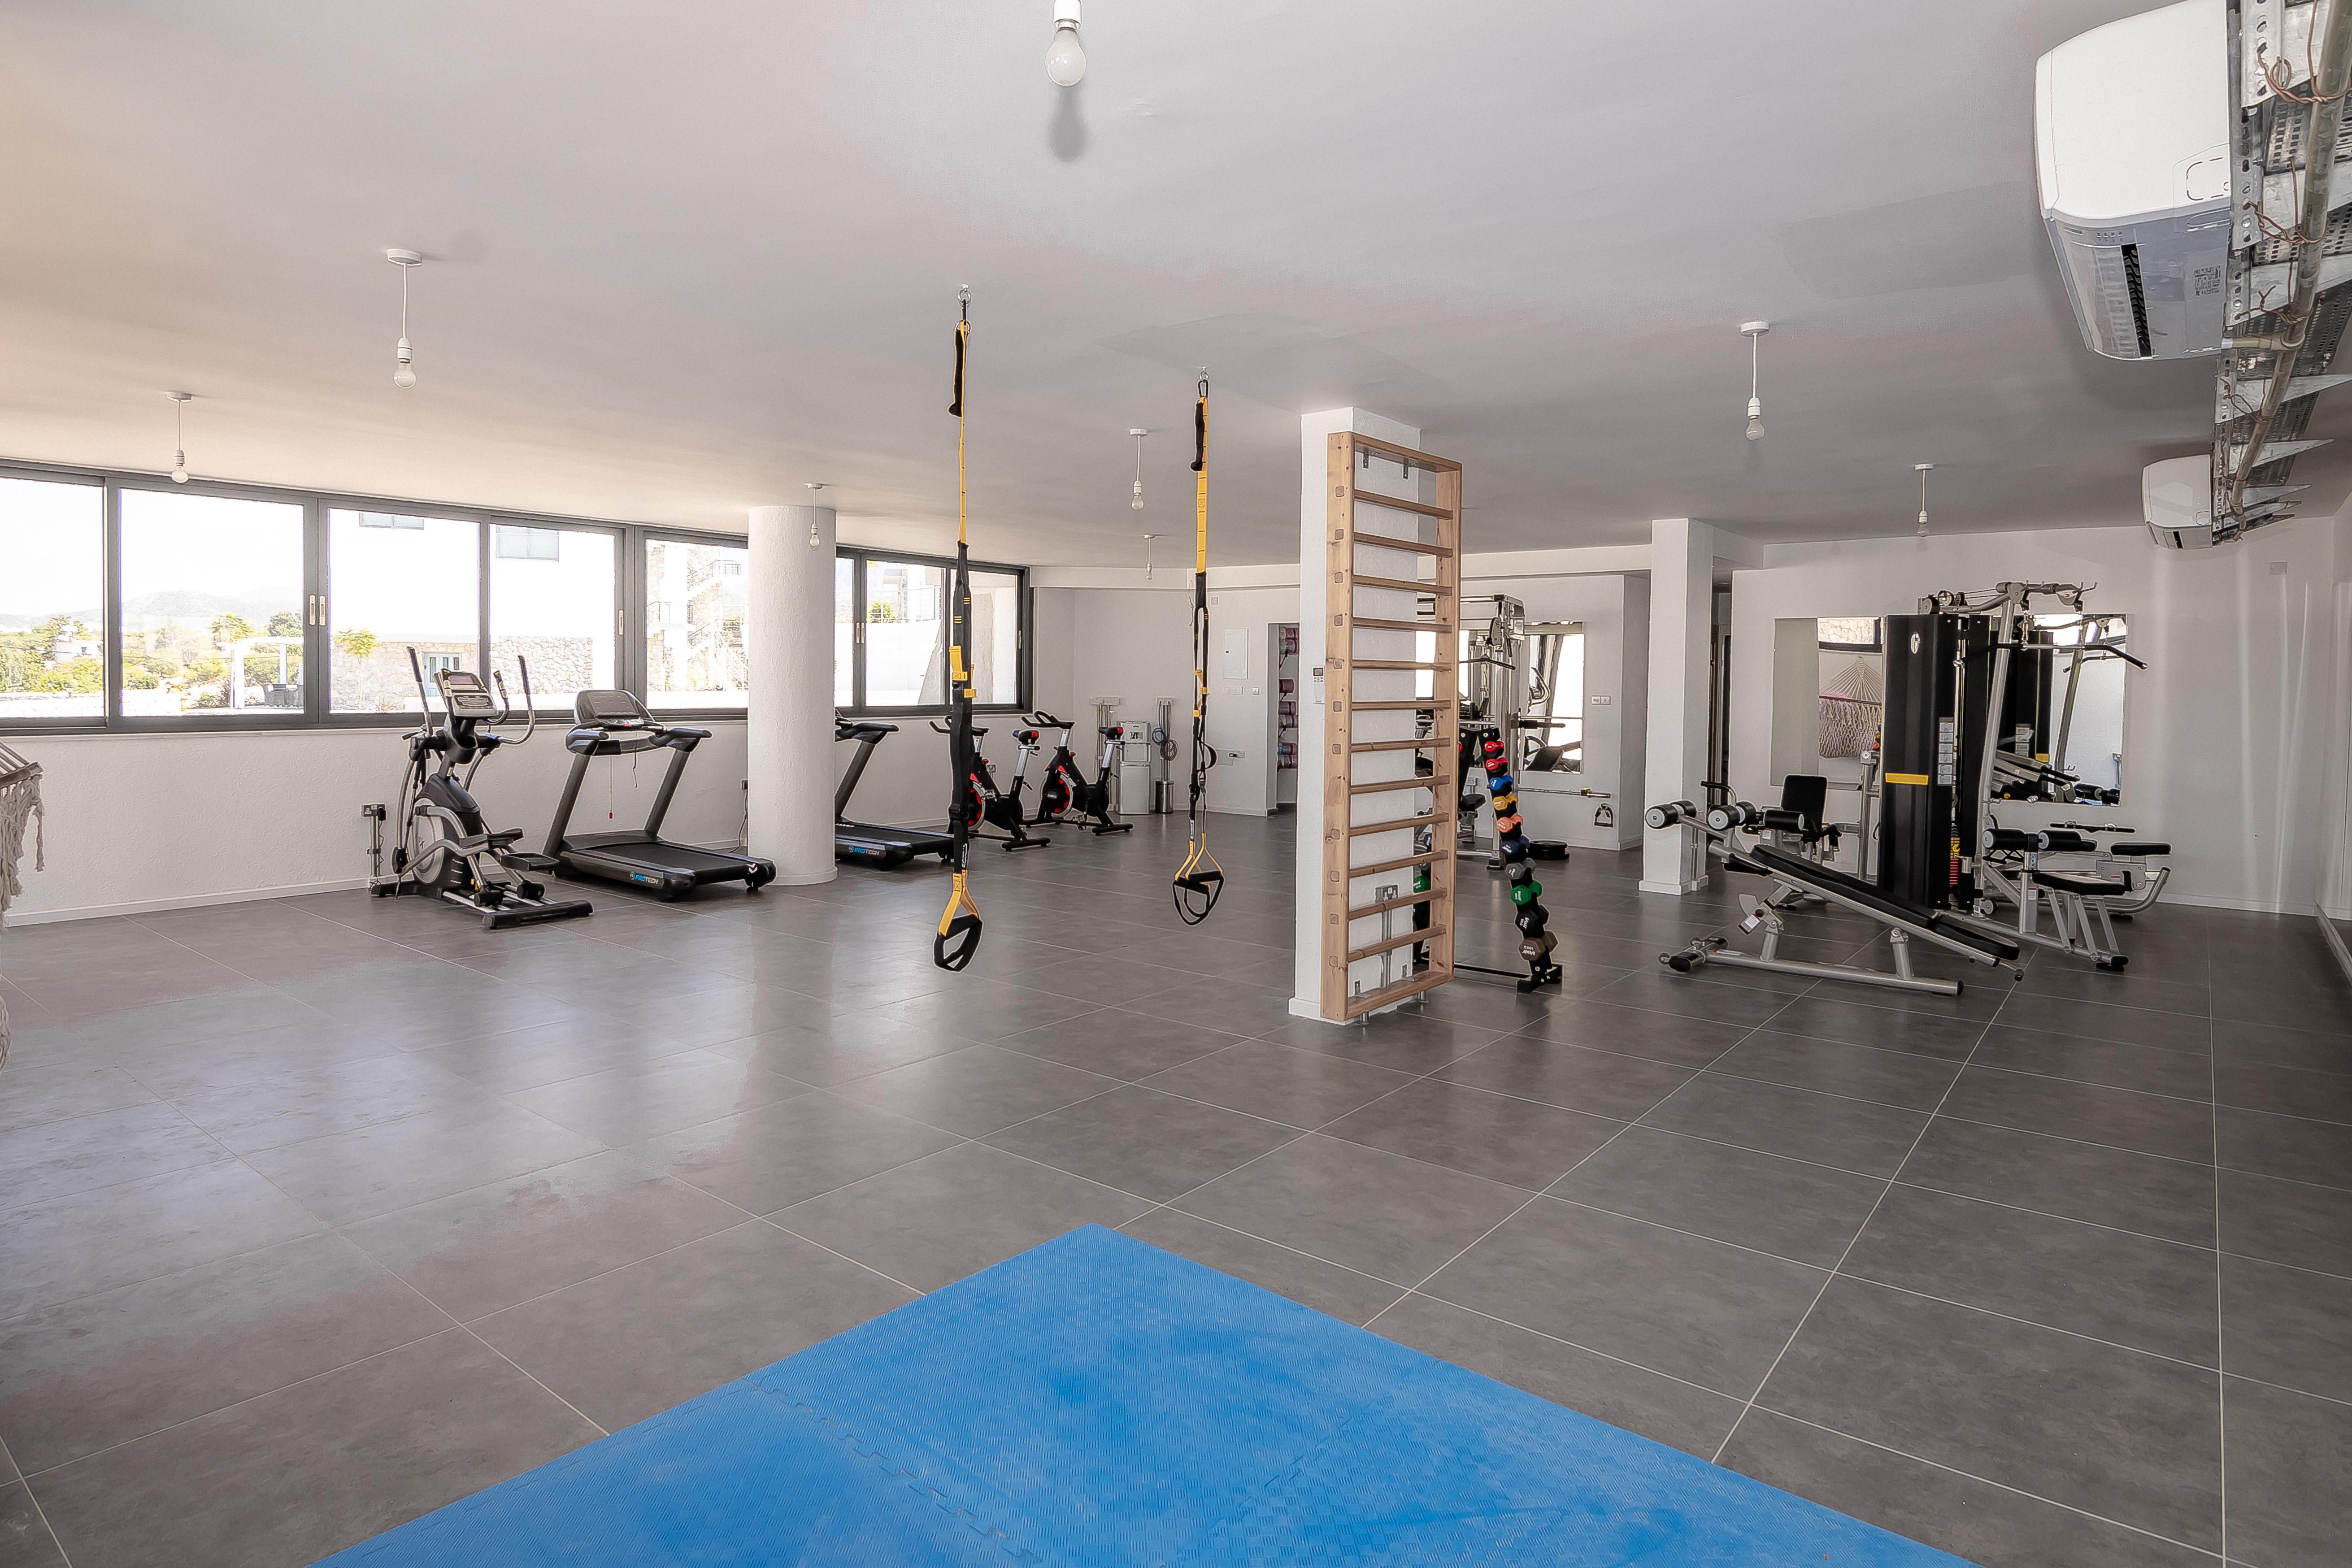 Apartment Joya Cyprus Starbright Garden Apartment photo 20403067